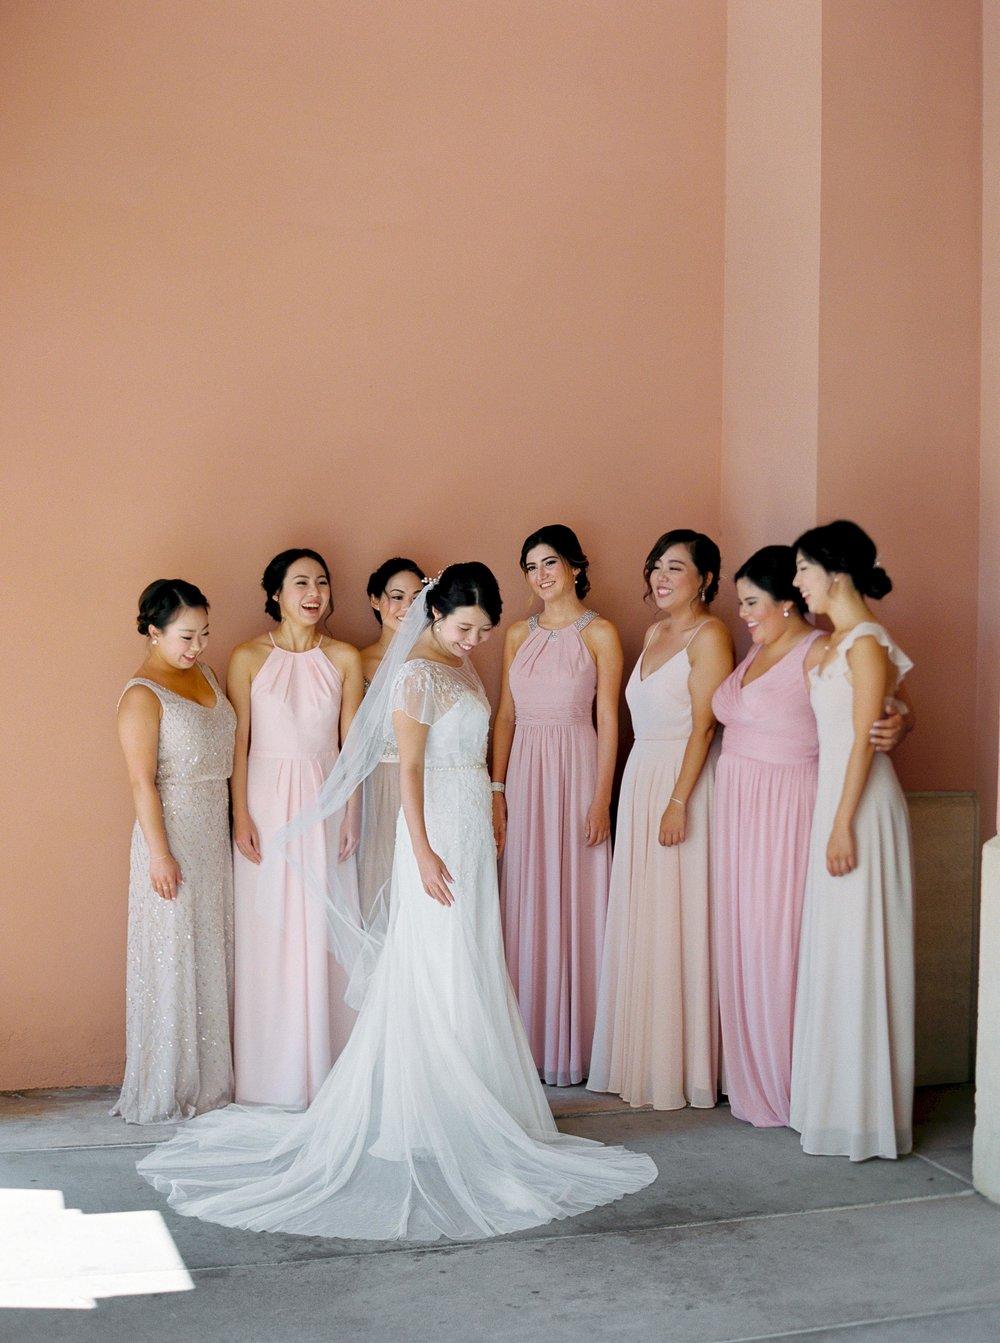 Villa_Montalvo_Wedding_Photographer_Videographer_San_Francisco031.jpg